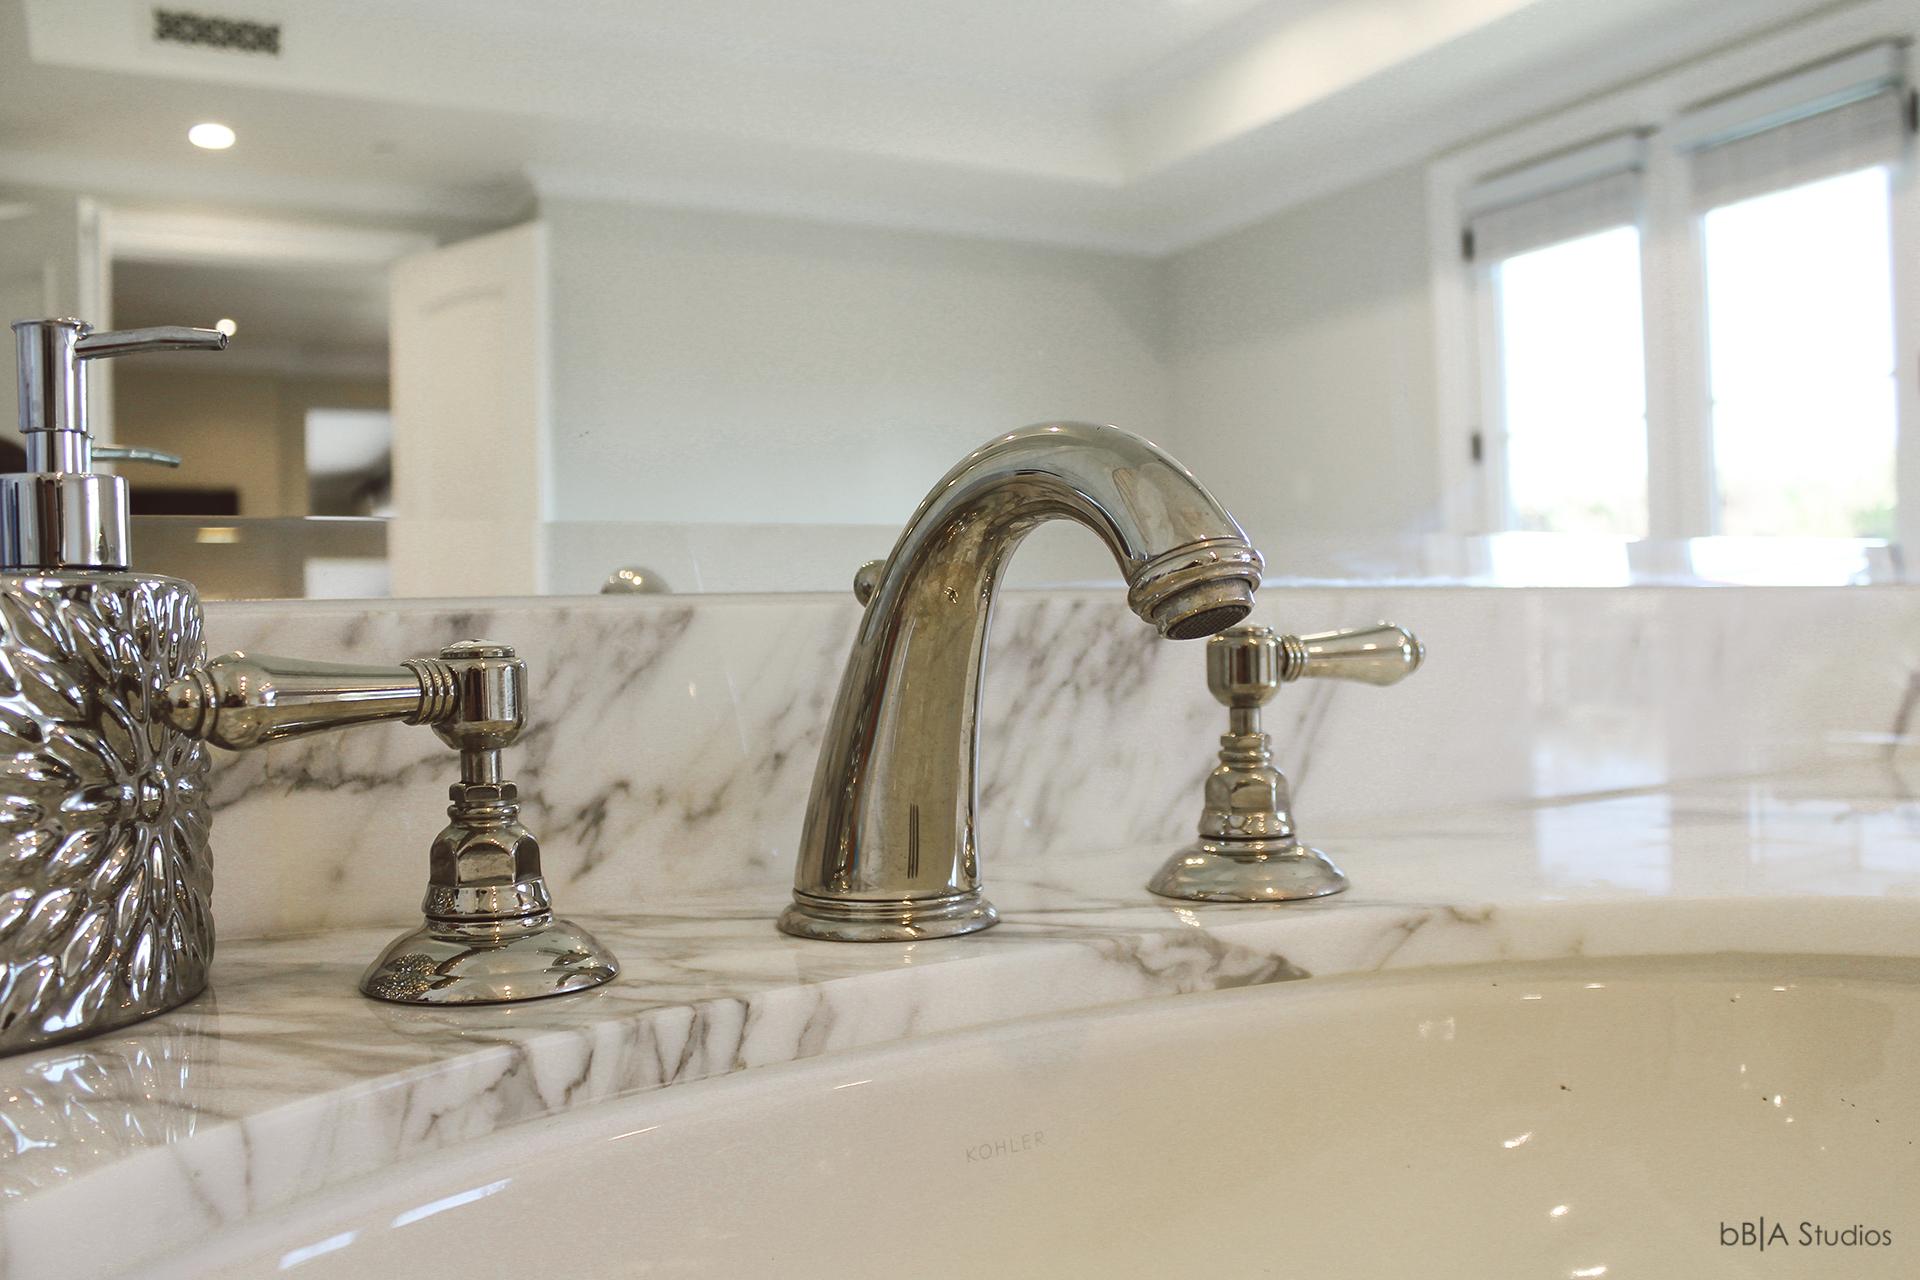 Sink detail